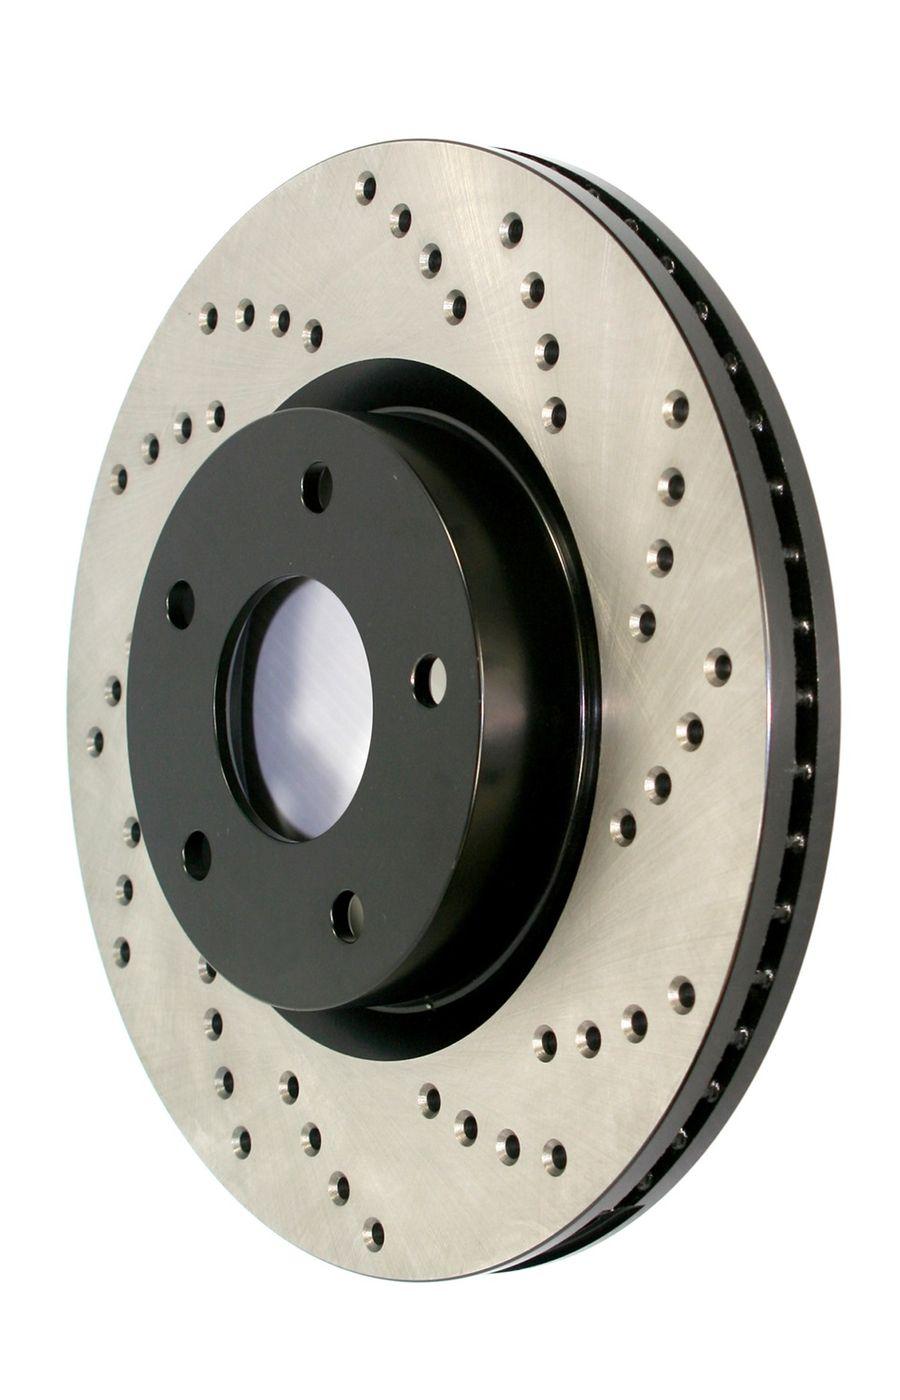 Mitsubishi Lancer StopTech Disc Brake Rotors Brakes StopTech Sport Drilled Disc 128.46065R